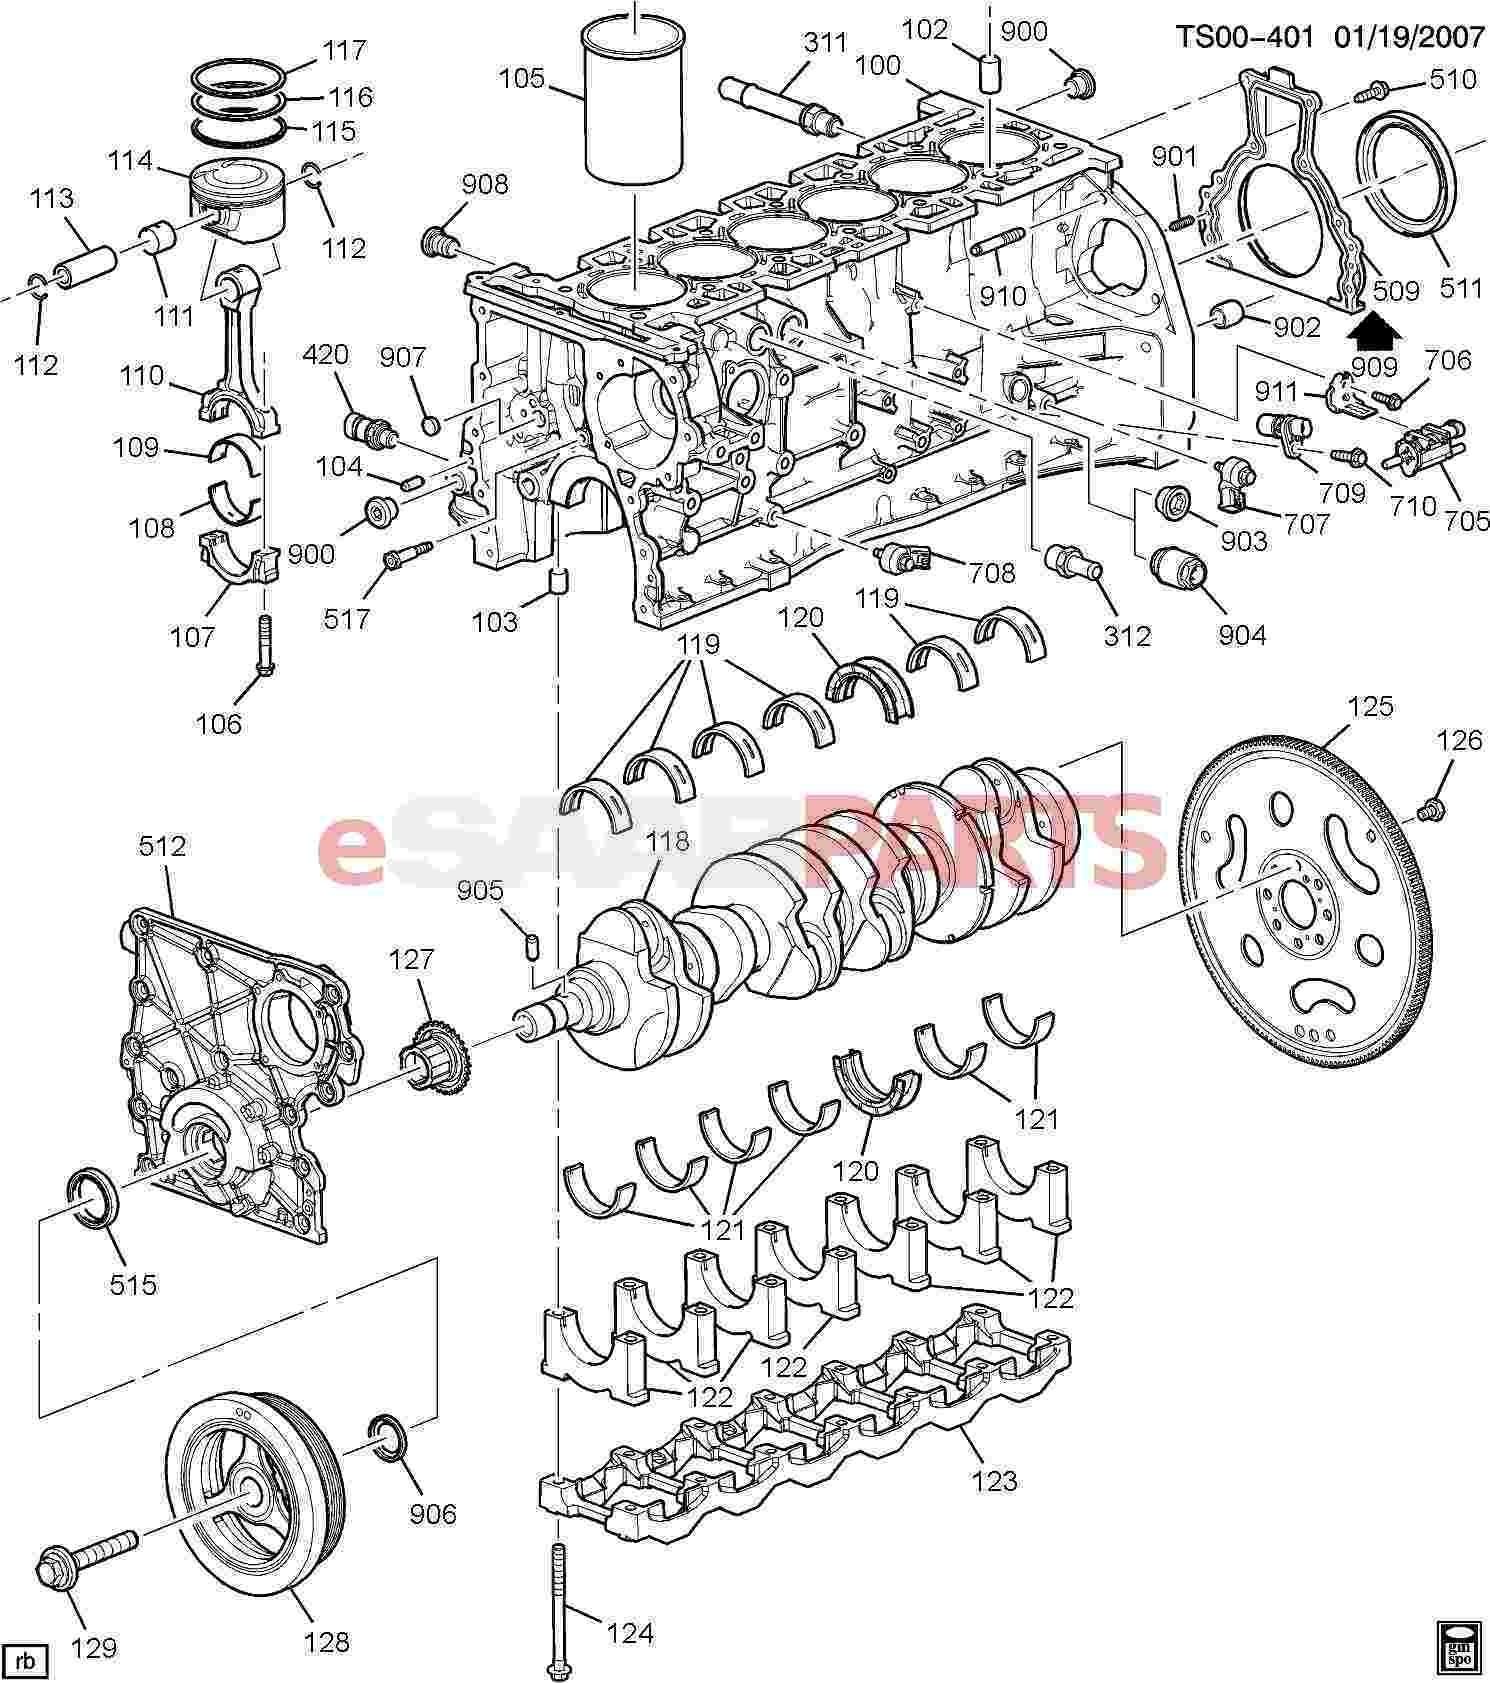 2003 chevy malibu engine diagram